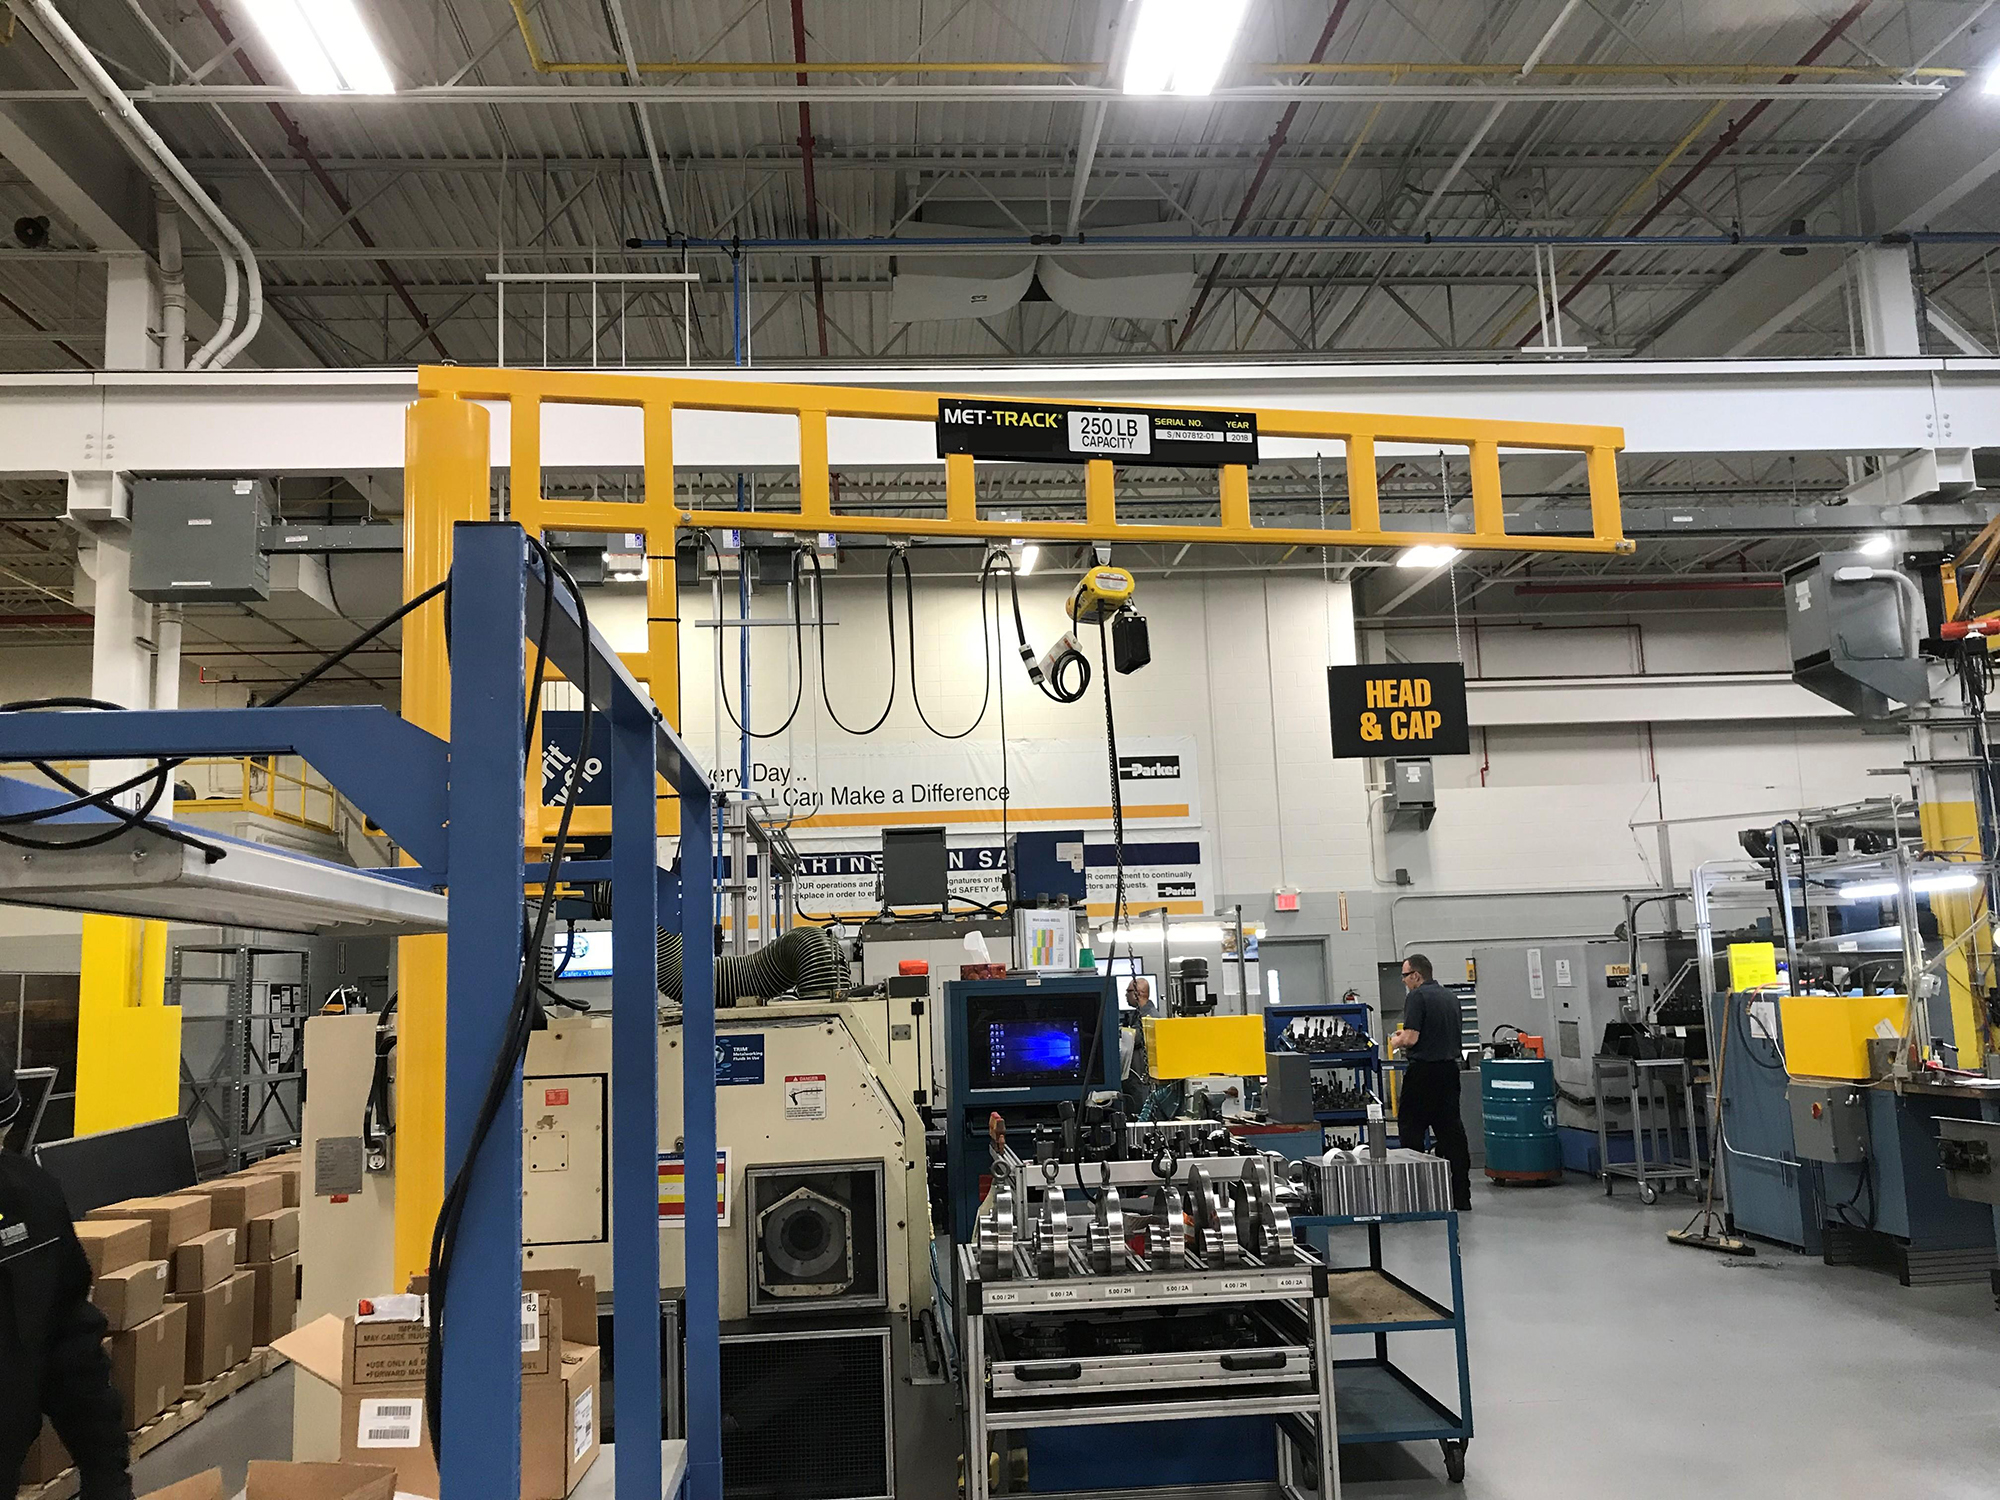 MET-TRACK Workstation Jib Crane - Floor Mounted